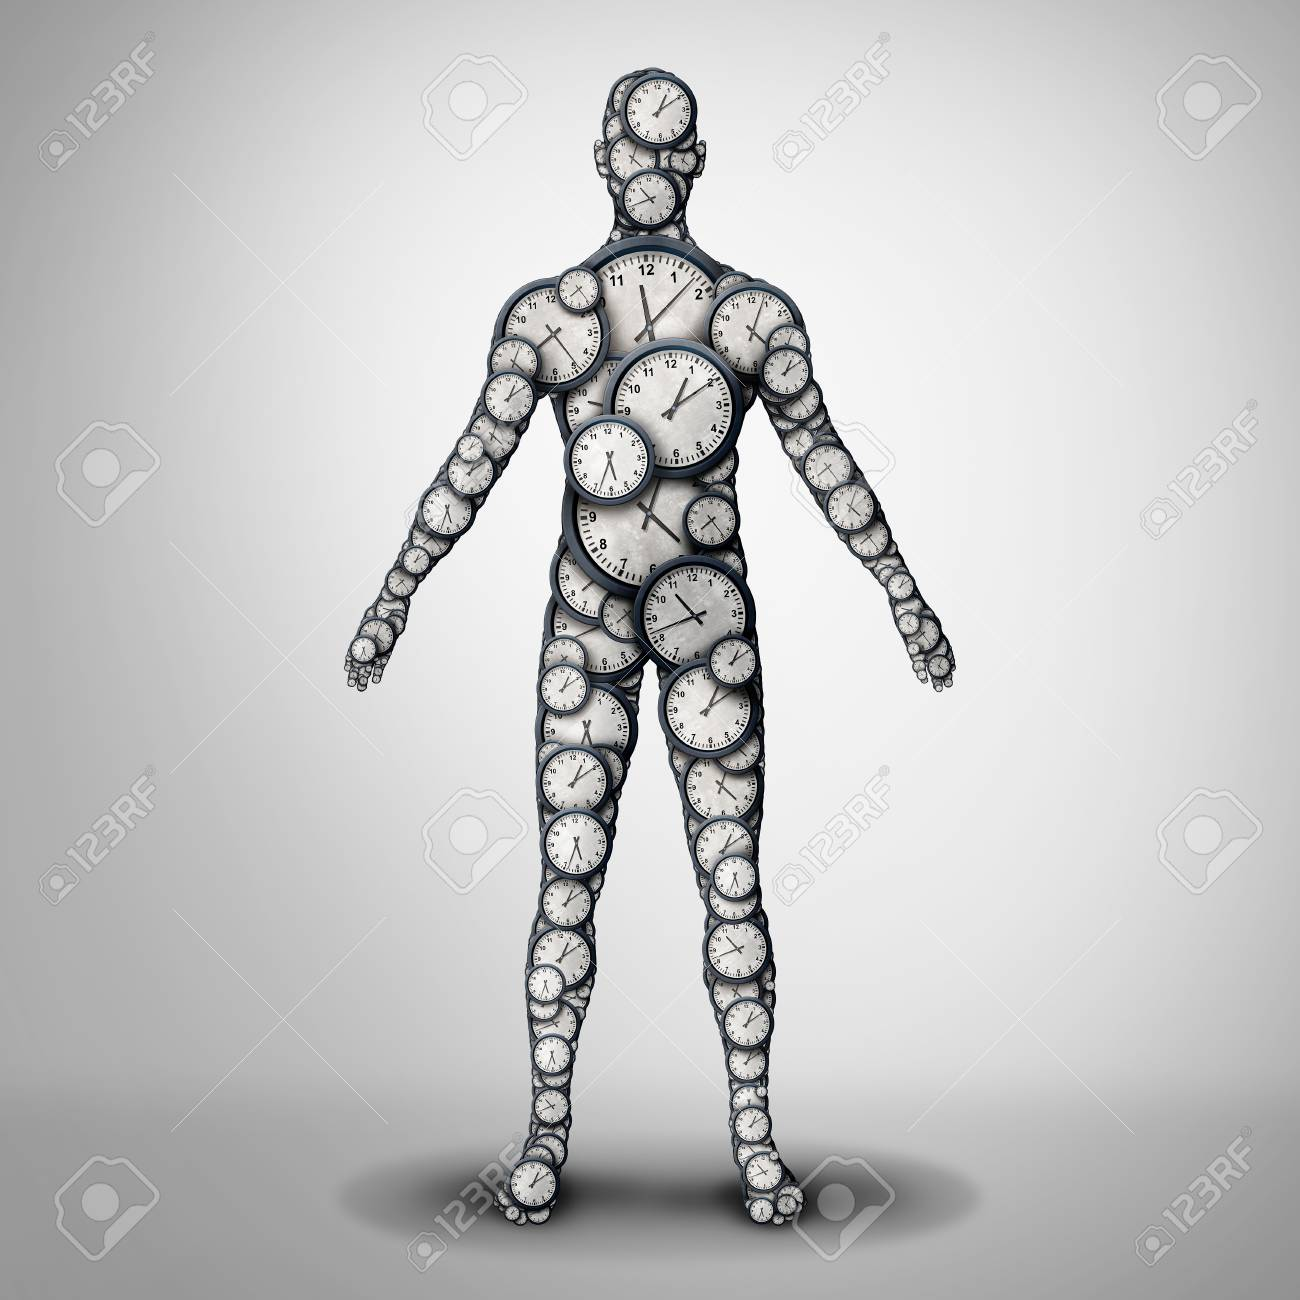 Body clock health and circadian rhythm or sleep disorder and life longevity or lifespan medicine concept as a 3D illustration. - 114513756